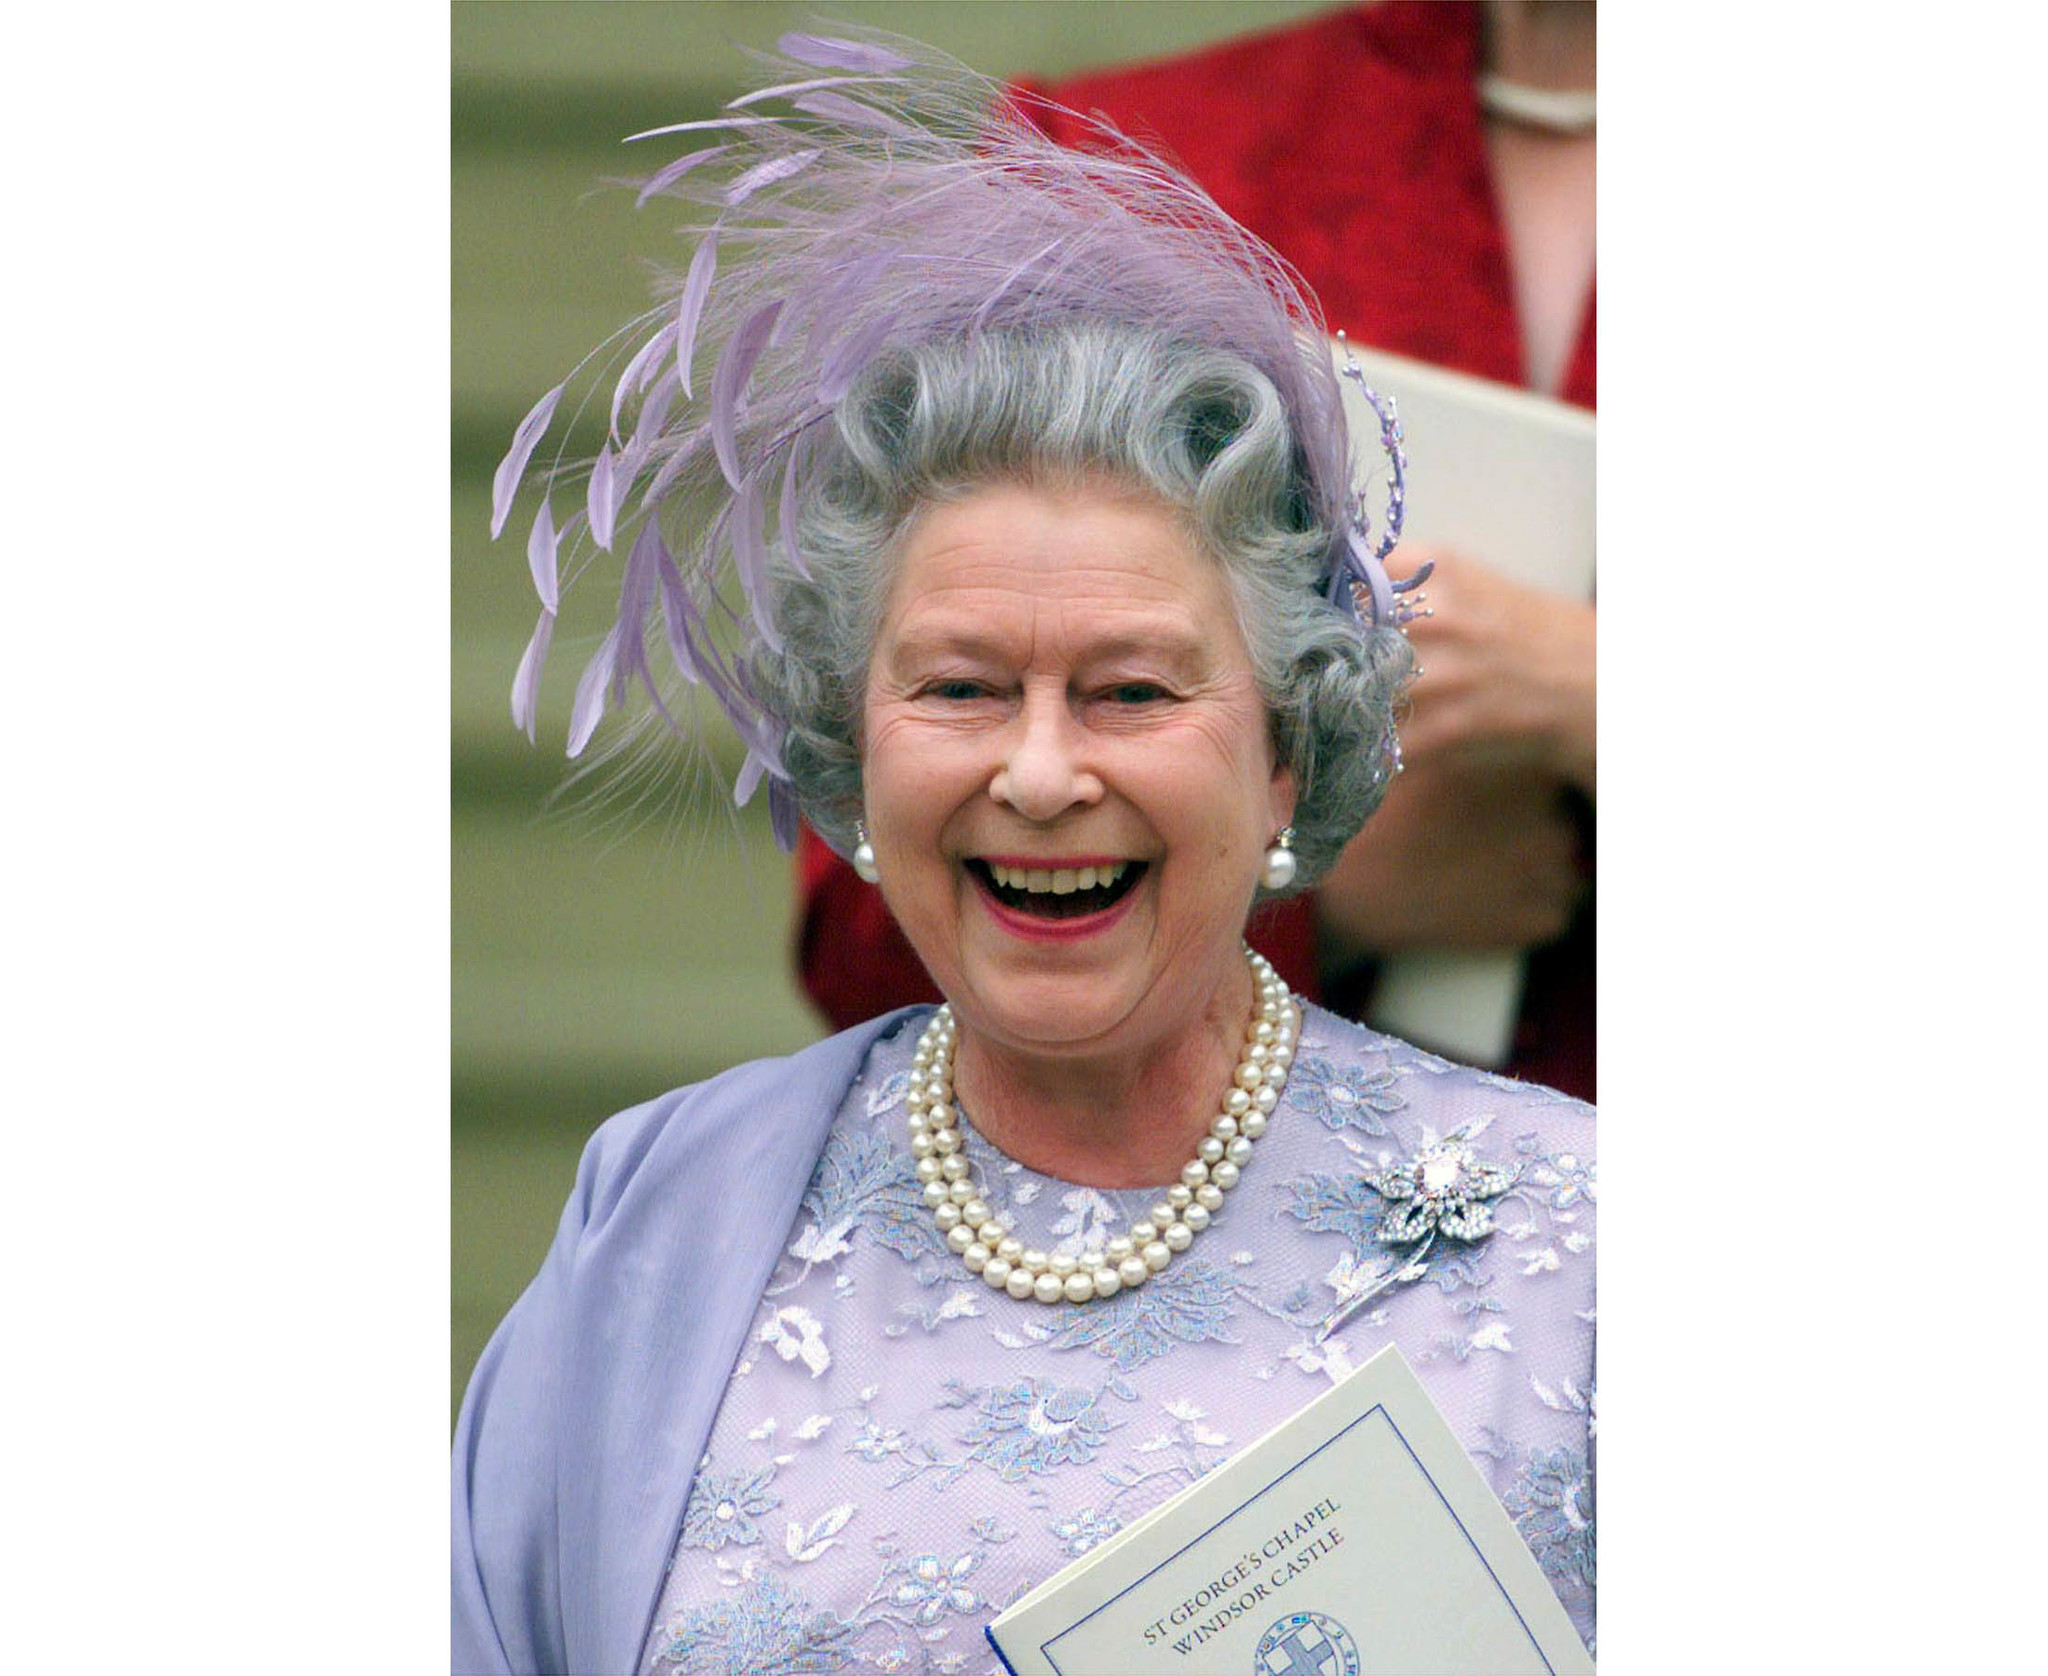 Trevor Rees Jones Invited Royal Wedding: Royal Wedding: The Invitation Says 'day Dress With Hat